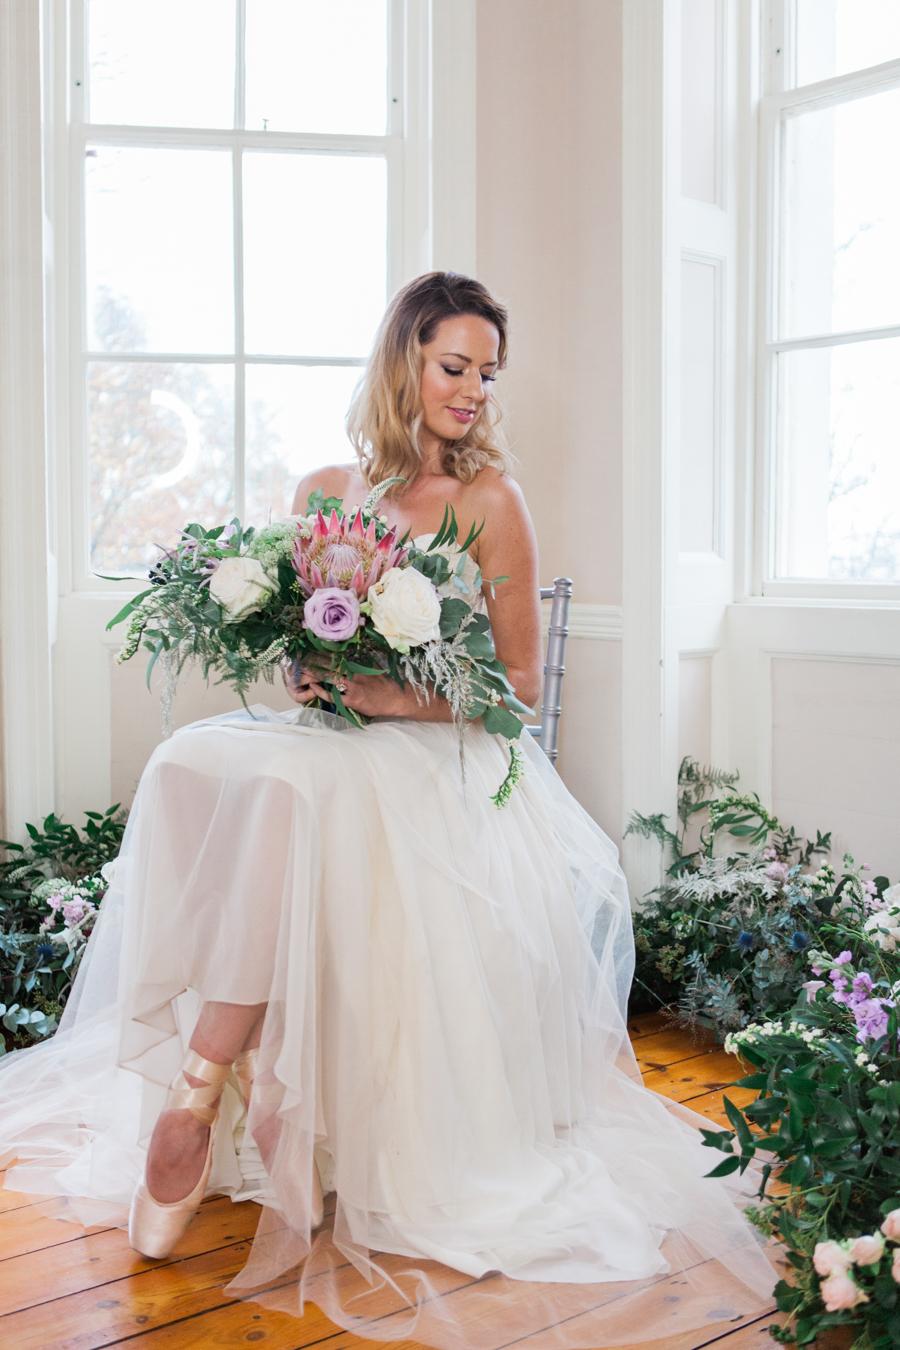 Starry celestial wedding inspiration (with a sprinkling of Disney magic) - Amanda Karen Photography (24)